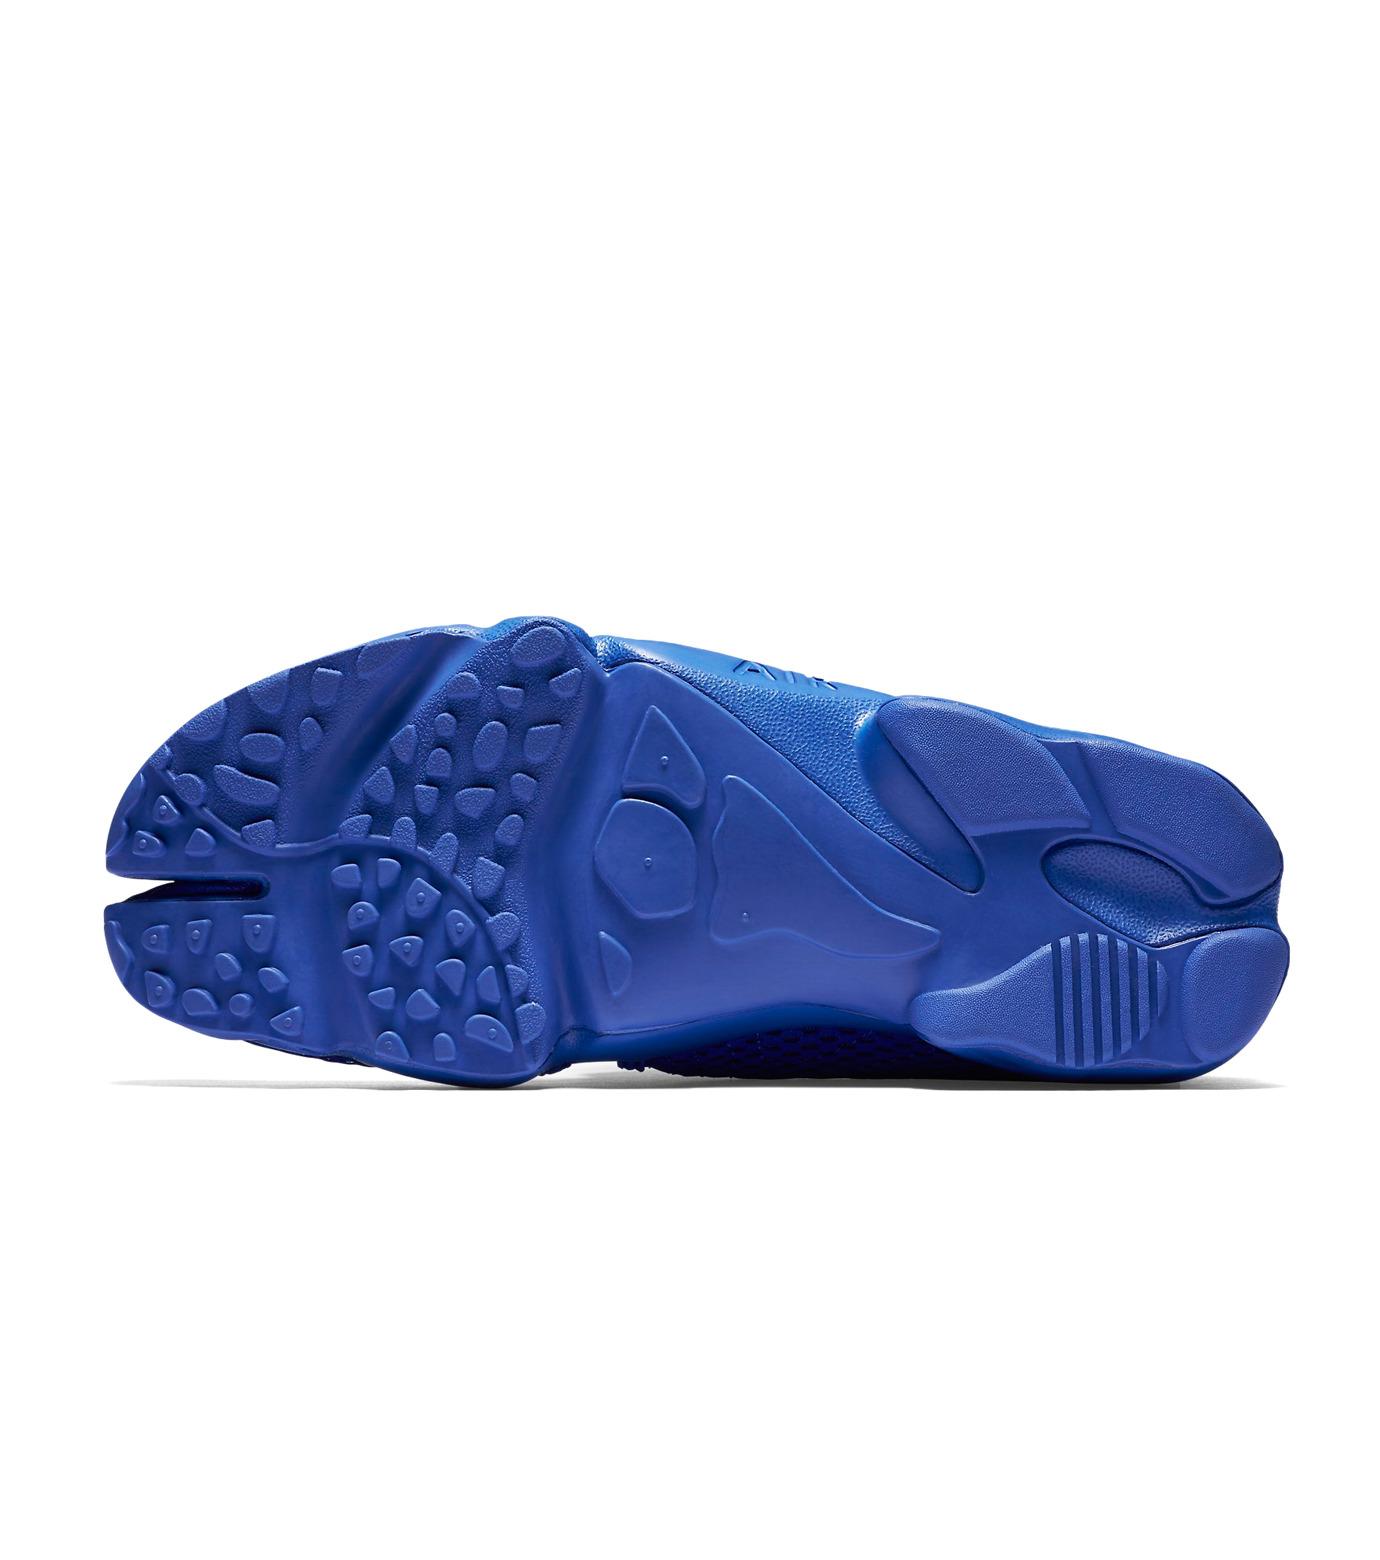 NIKE(ナイキ)のAir Rift Breathe-BLUE(シューズ/shoes)-847609-400-92 拡大詳細画像2